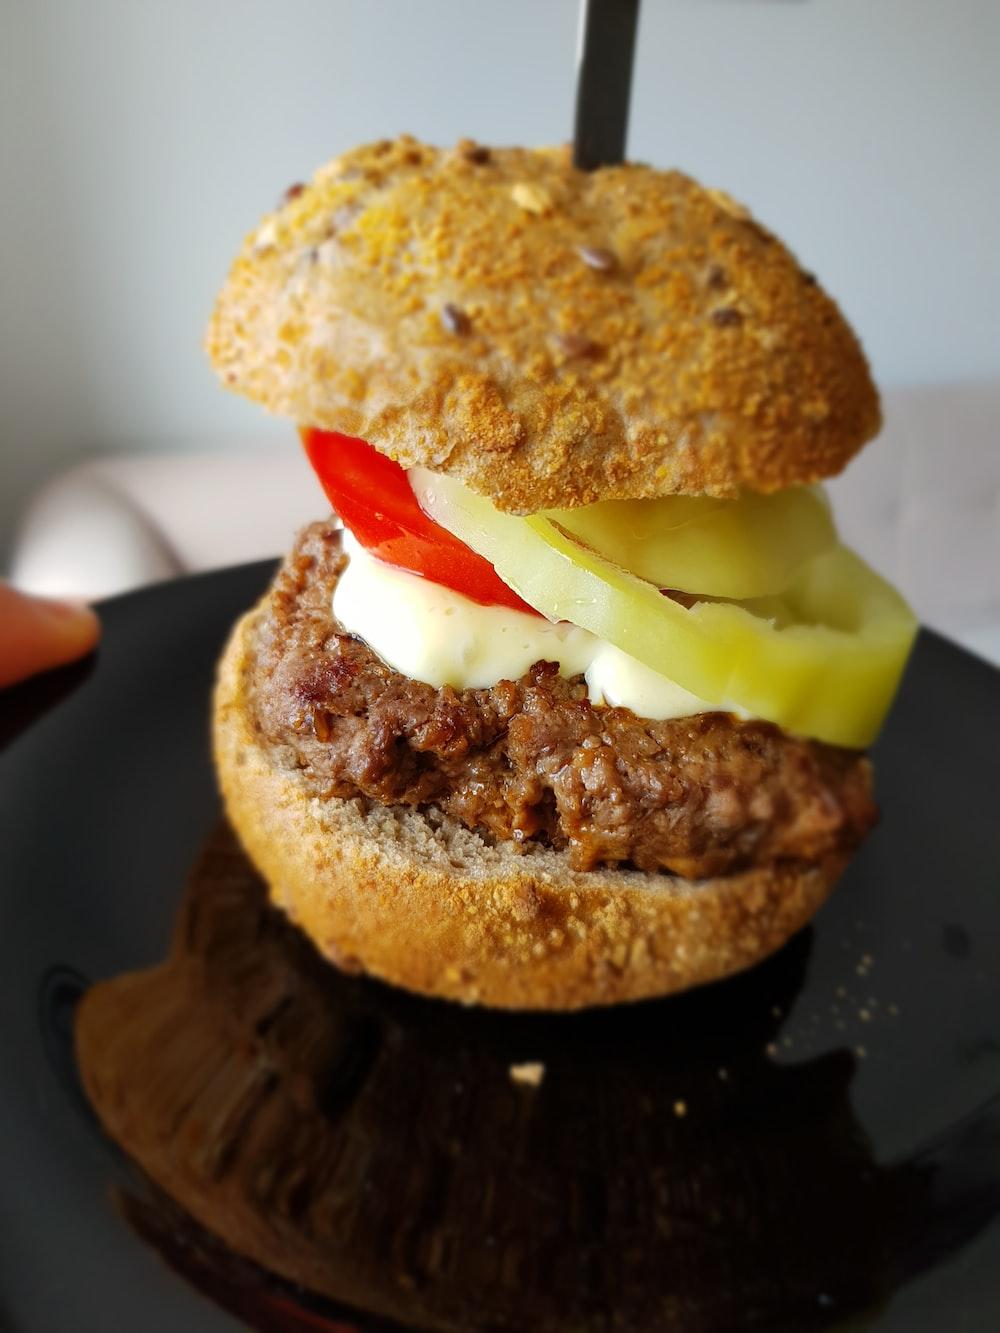 burger on black surface